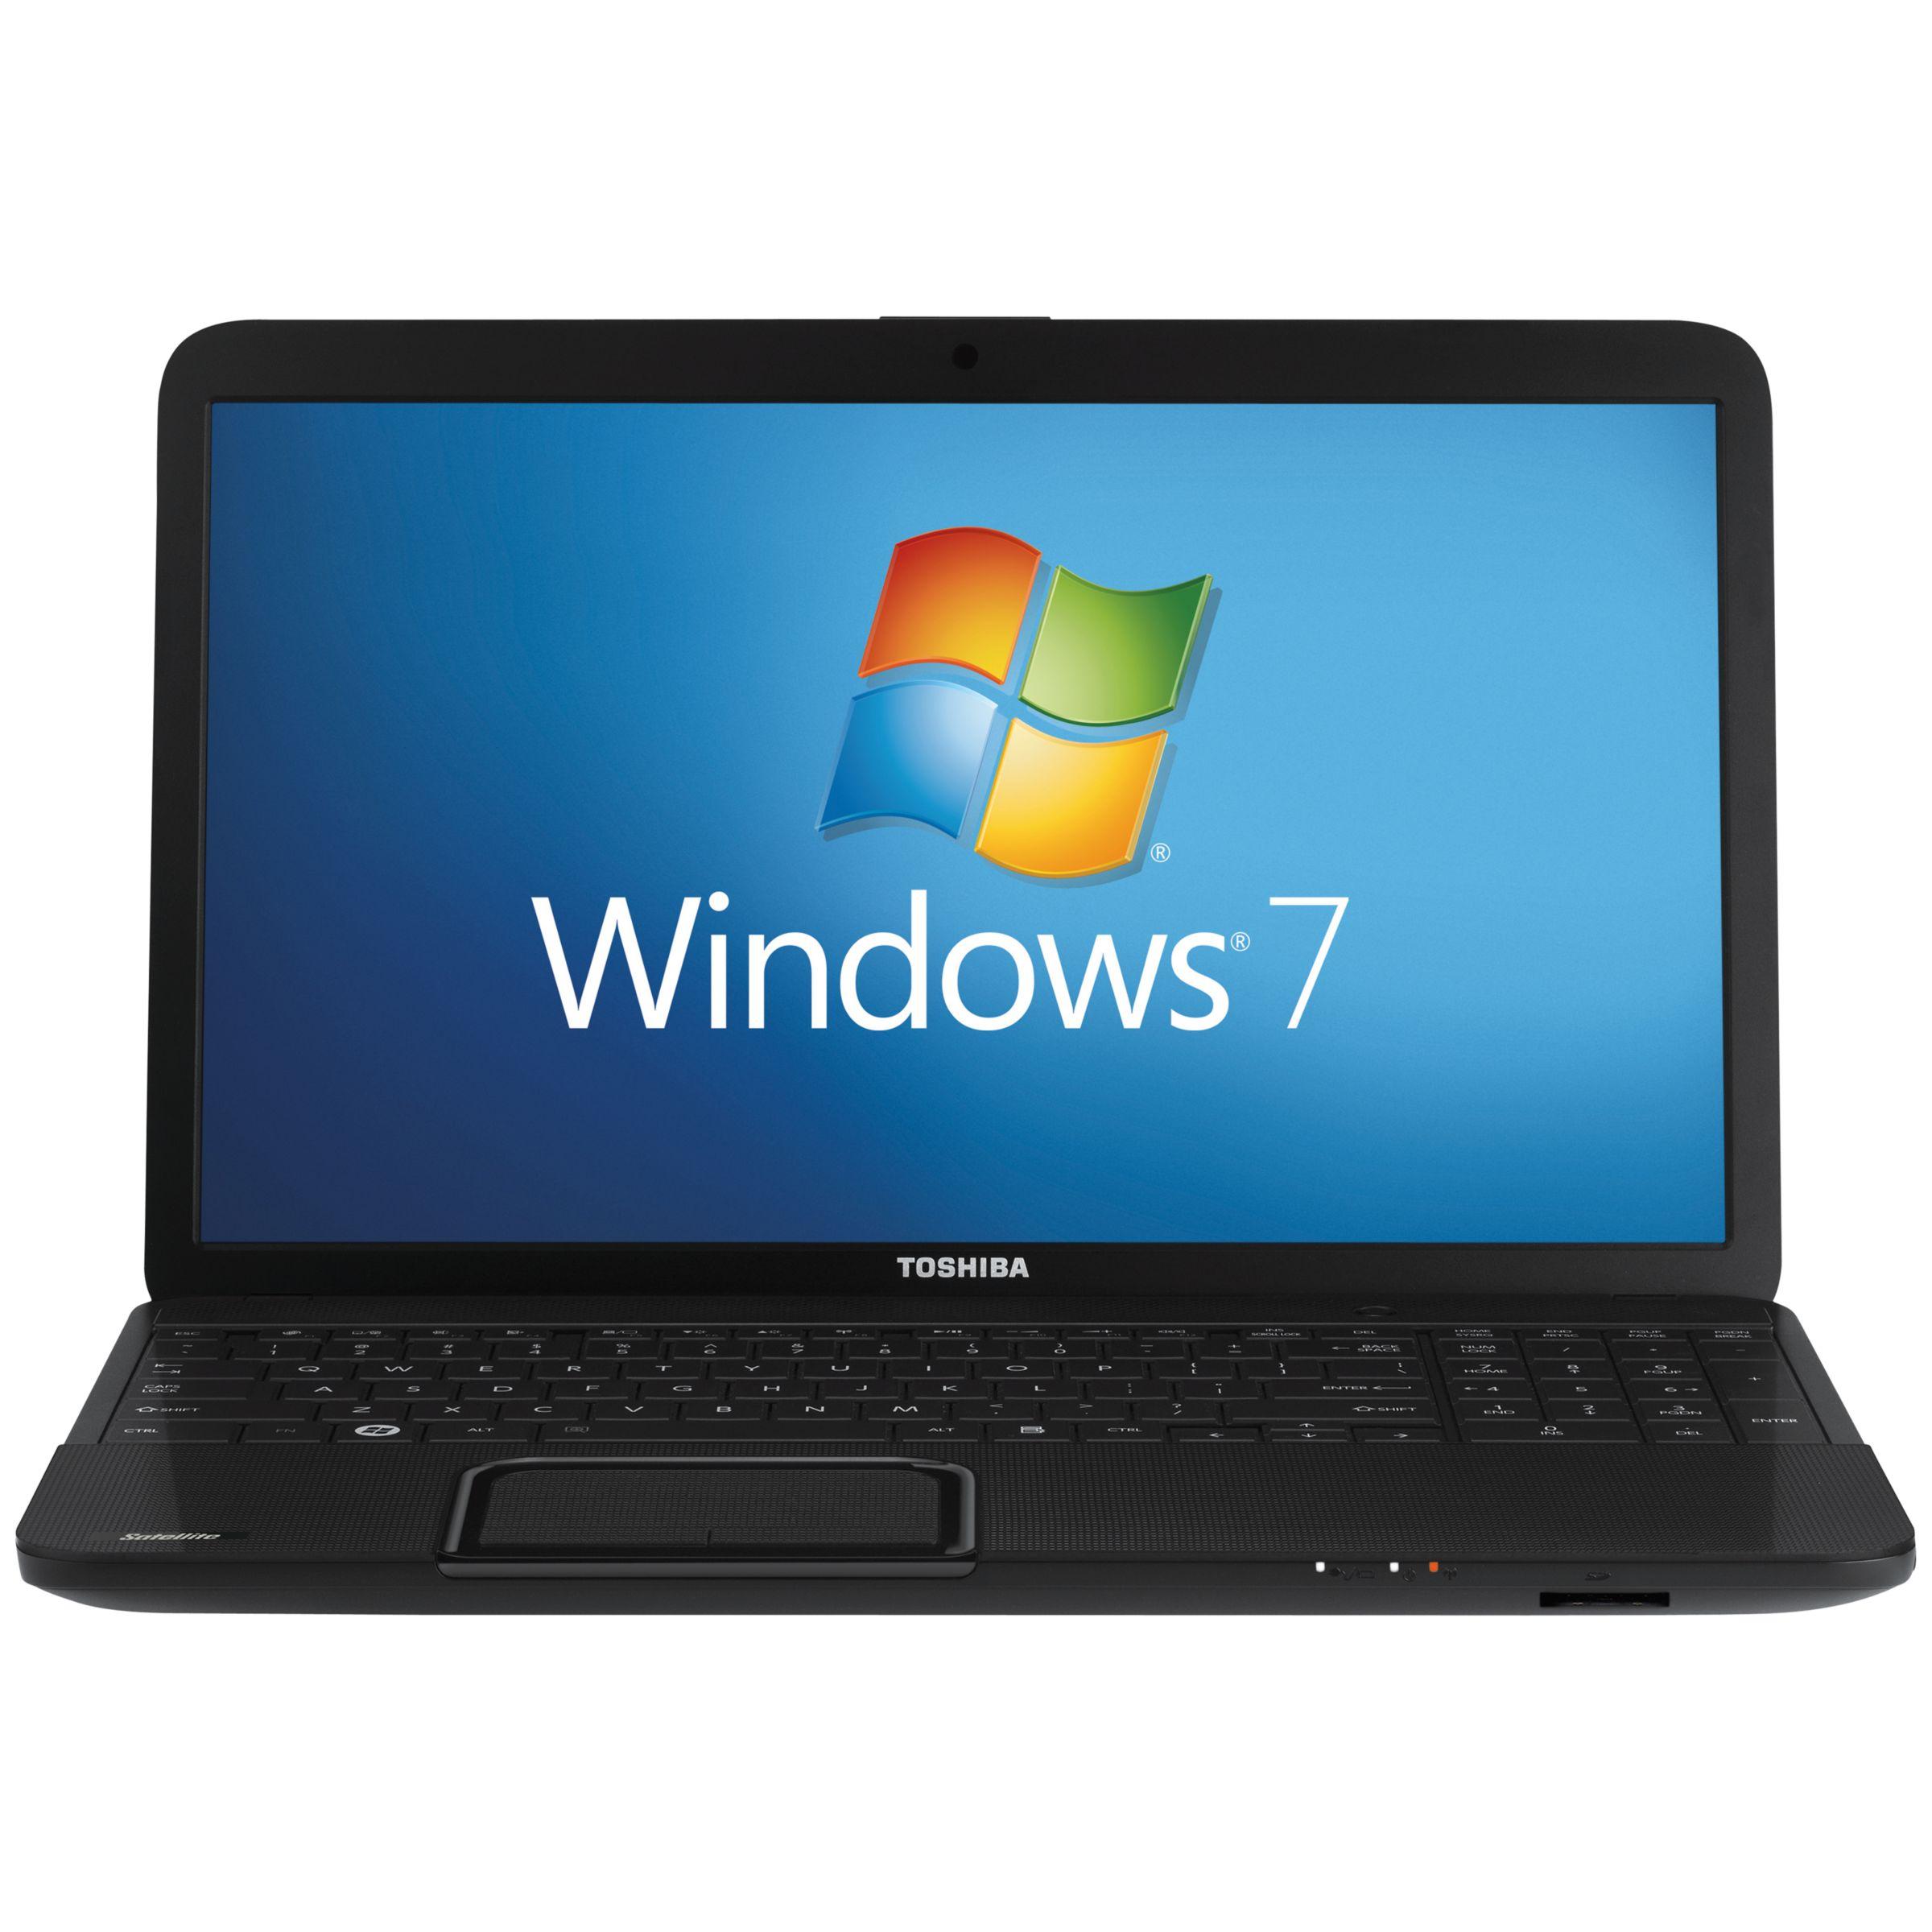 "Toshiba Satellite C850-132 Laptop, Intel Pentium B950, 2.1ghz, 4gb Ram, 500gb, 15.6"", Black"